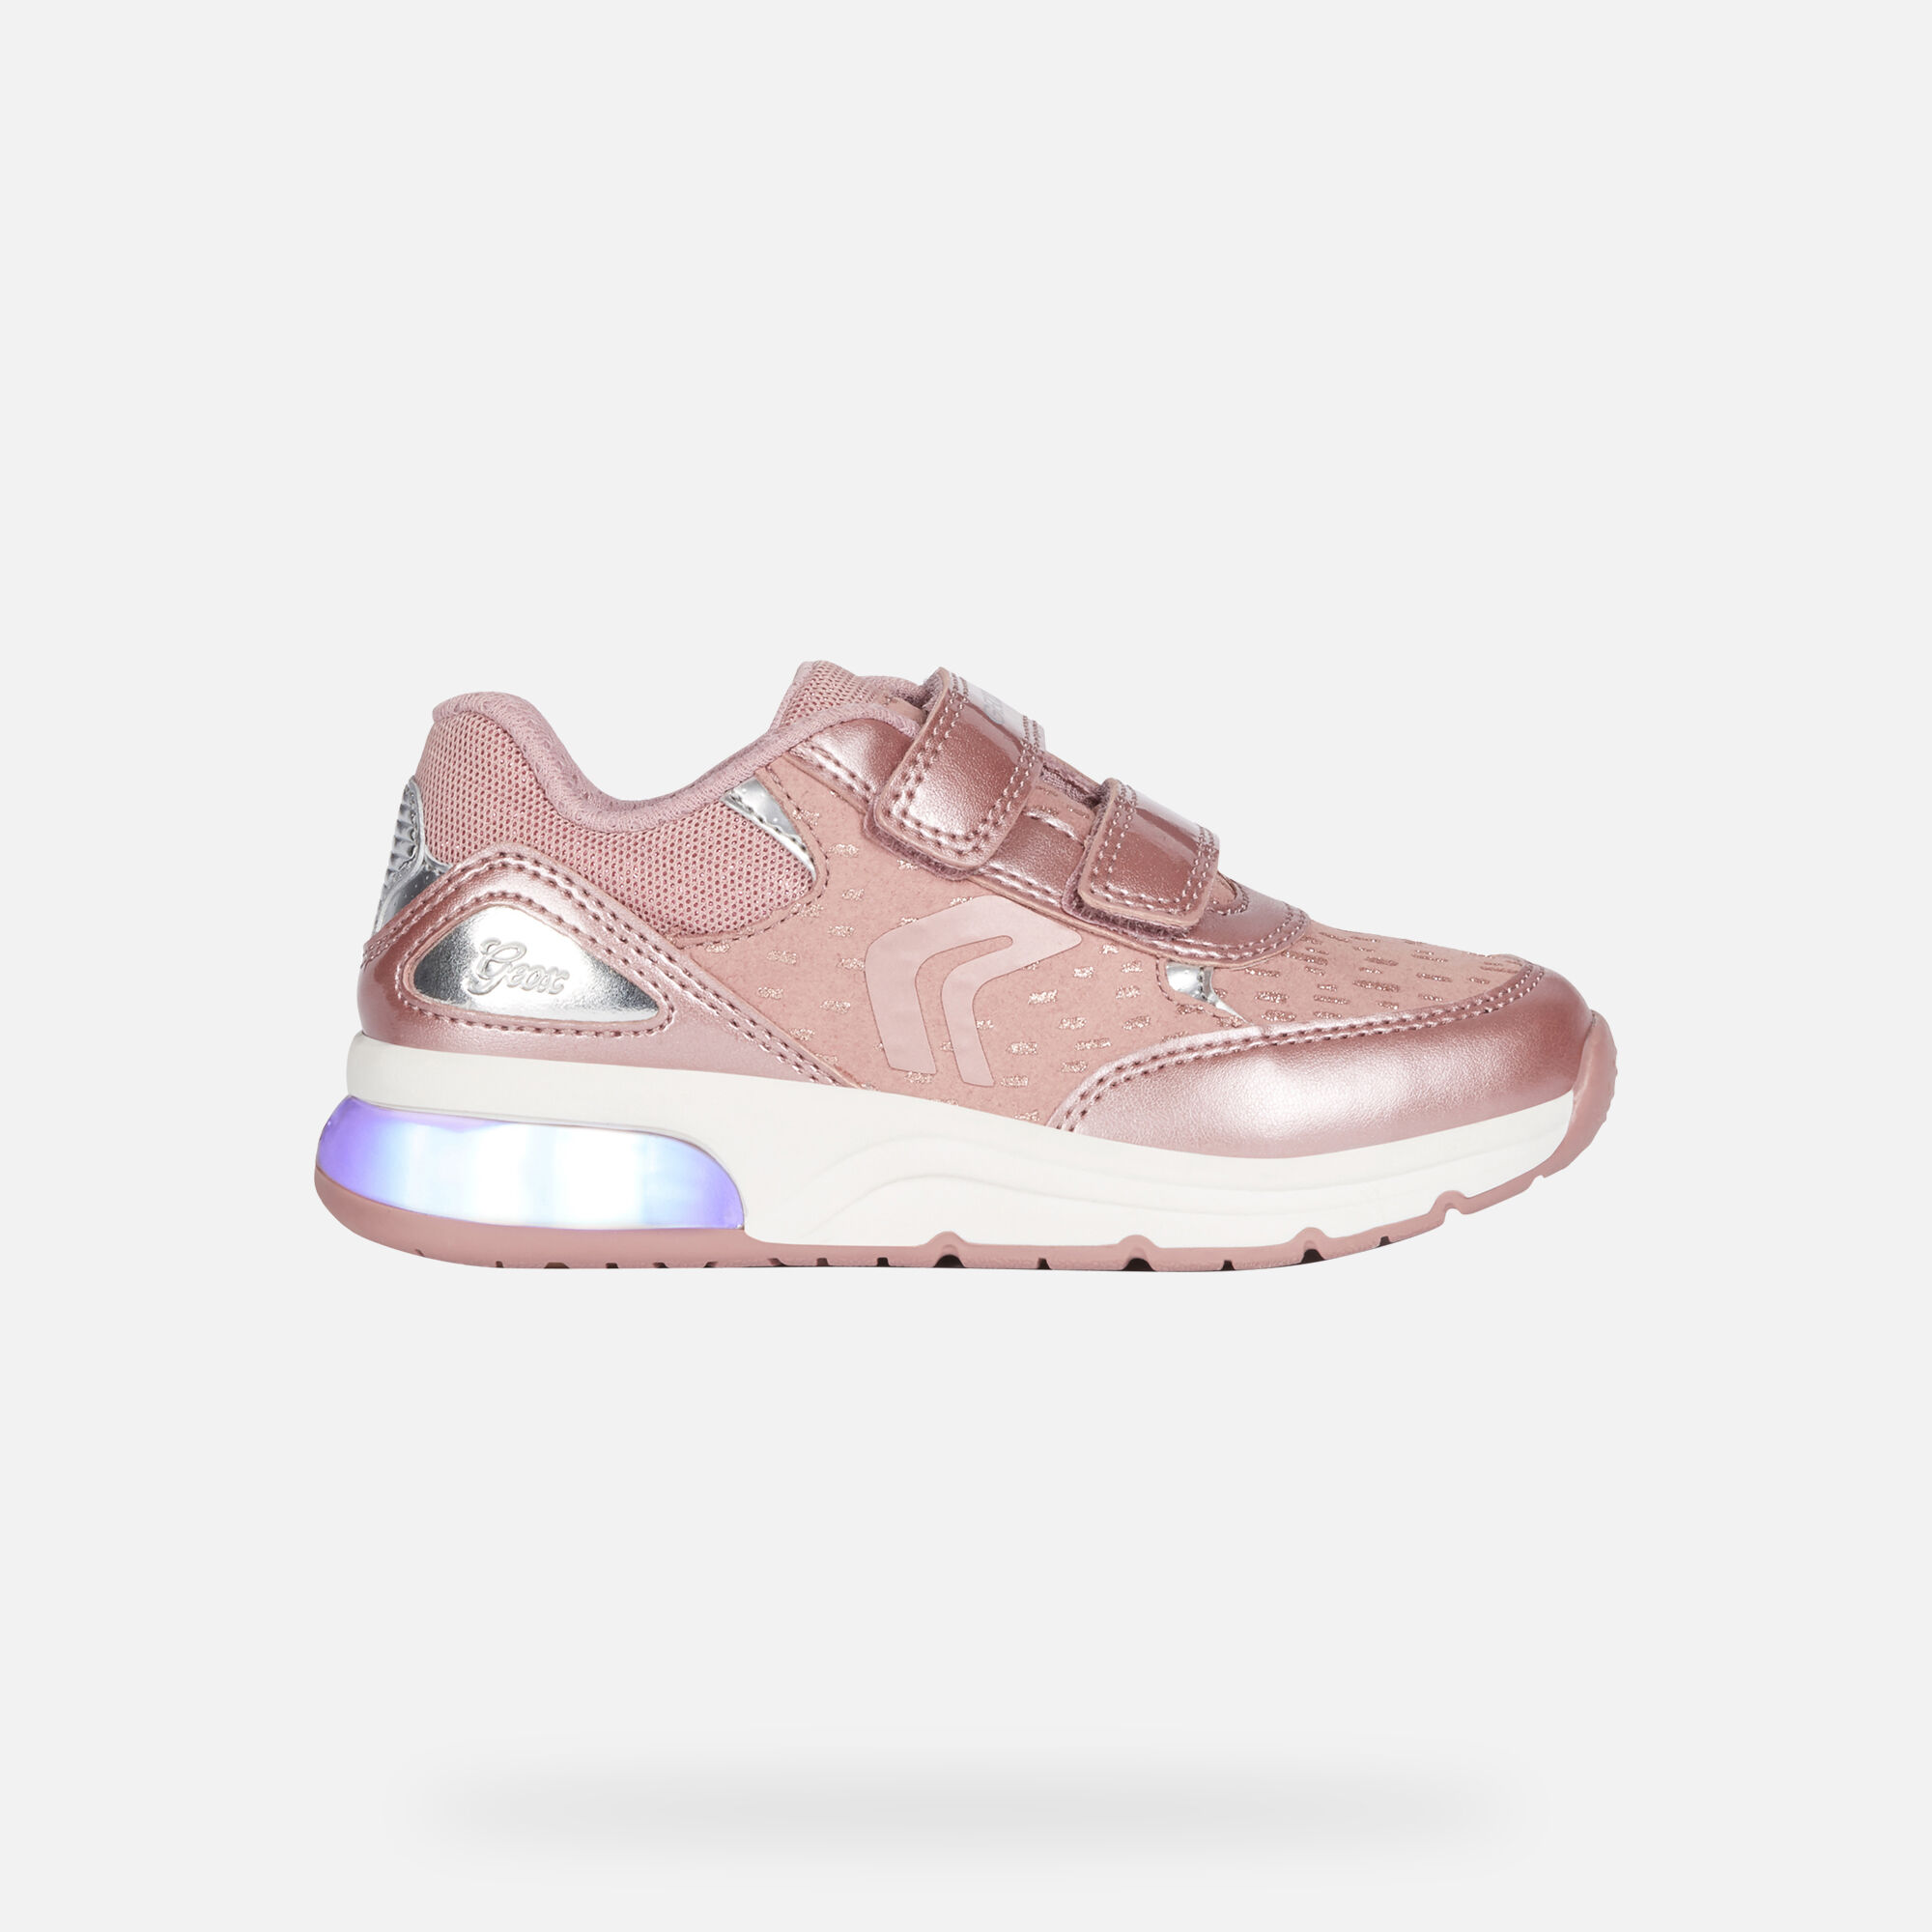 chaussure geox promo sneacker 38